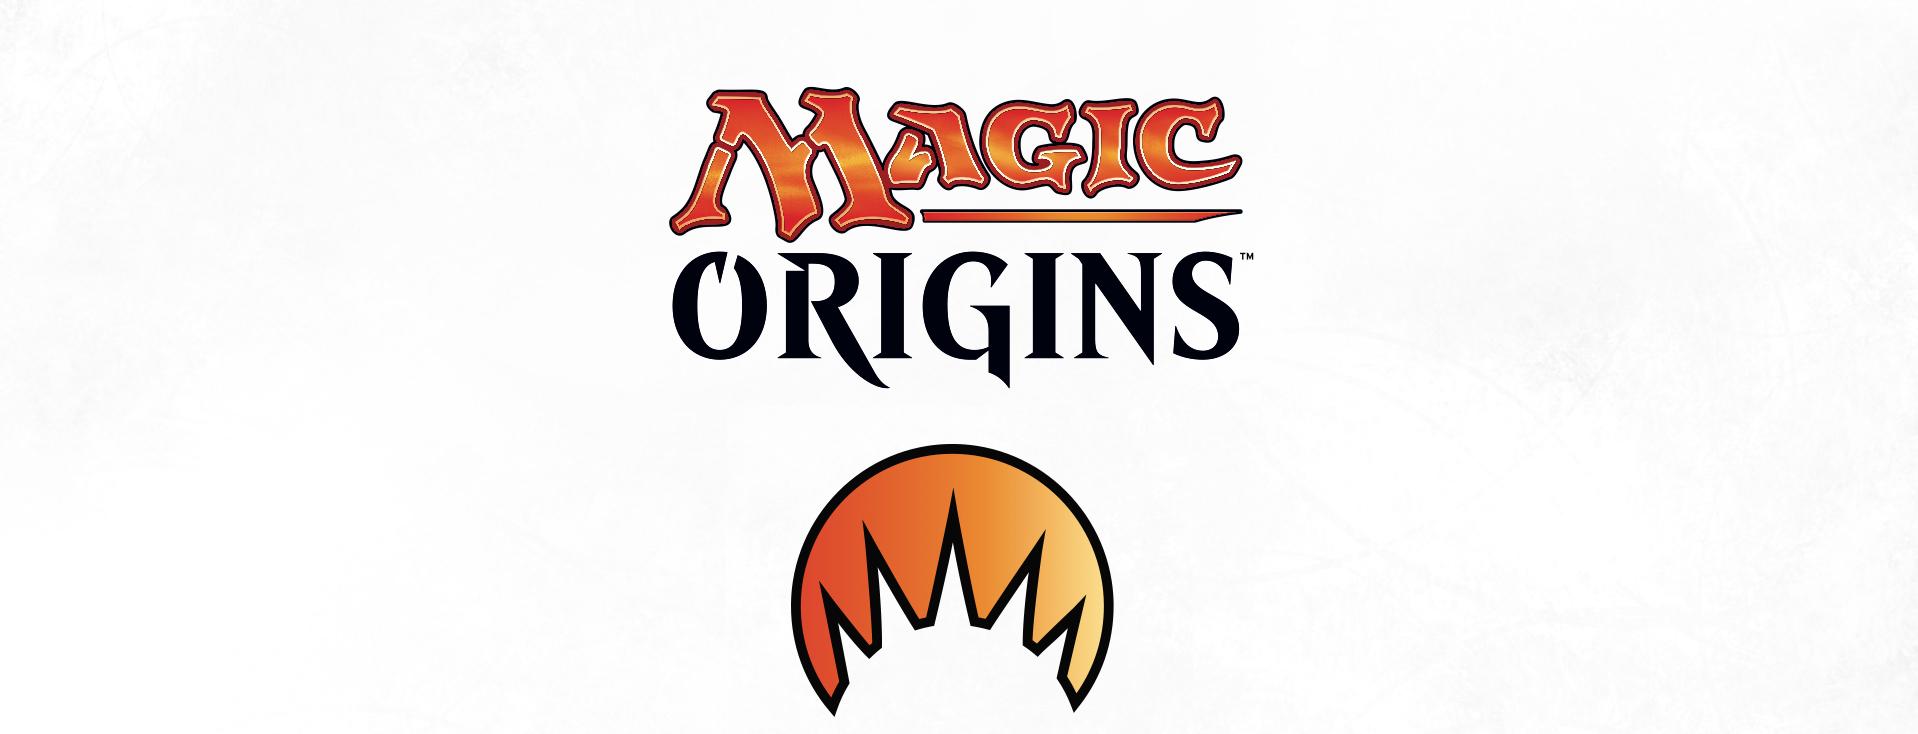 Magic Origins Set Coming Next July